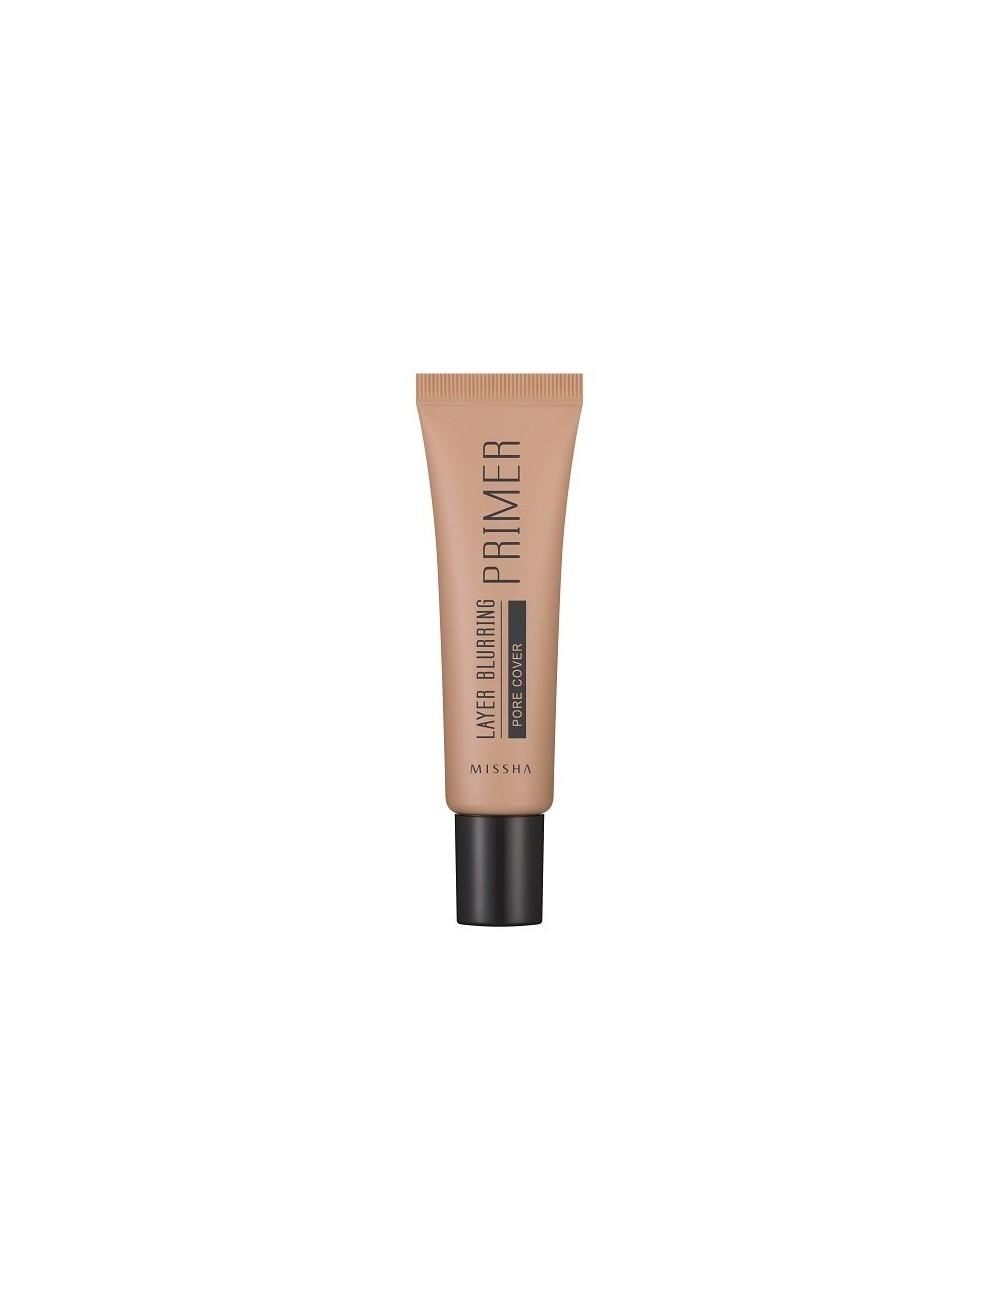 Primer Corrector Poros - Missha Layer Blurring Primer (Pore Cover) 20ml